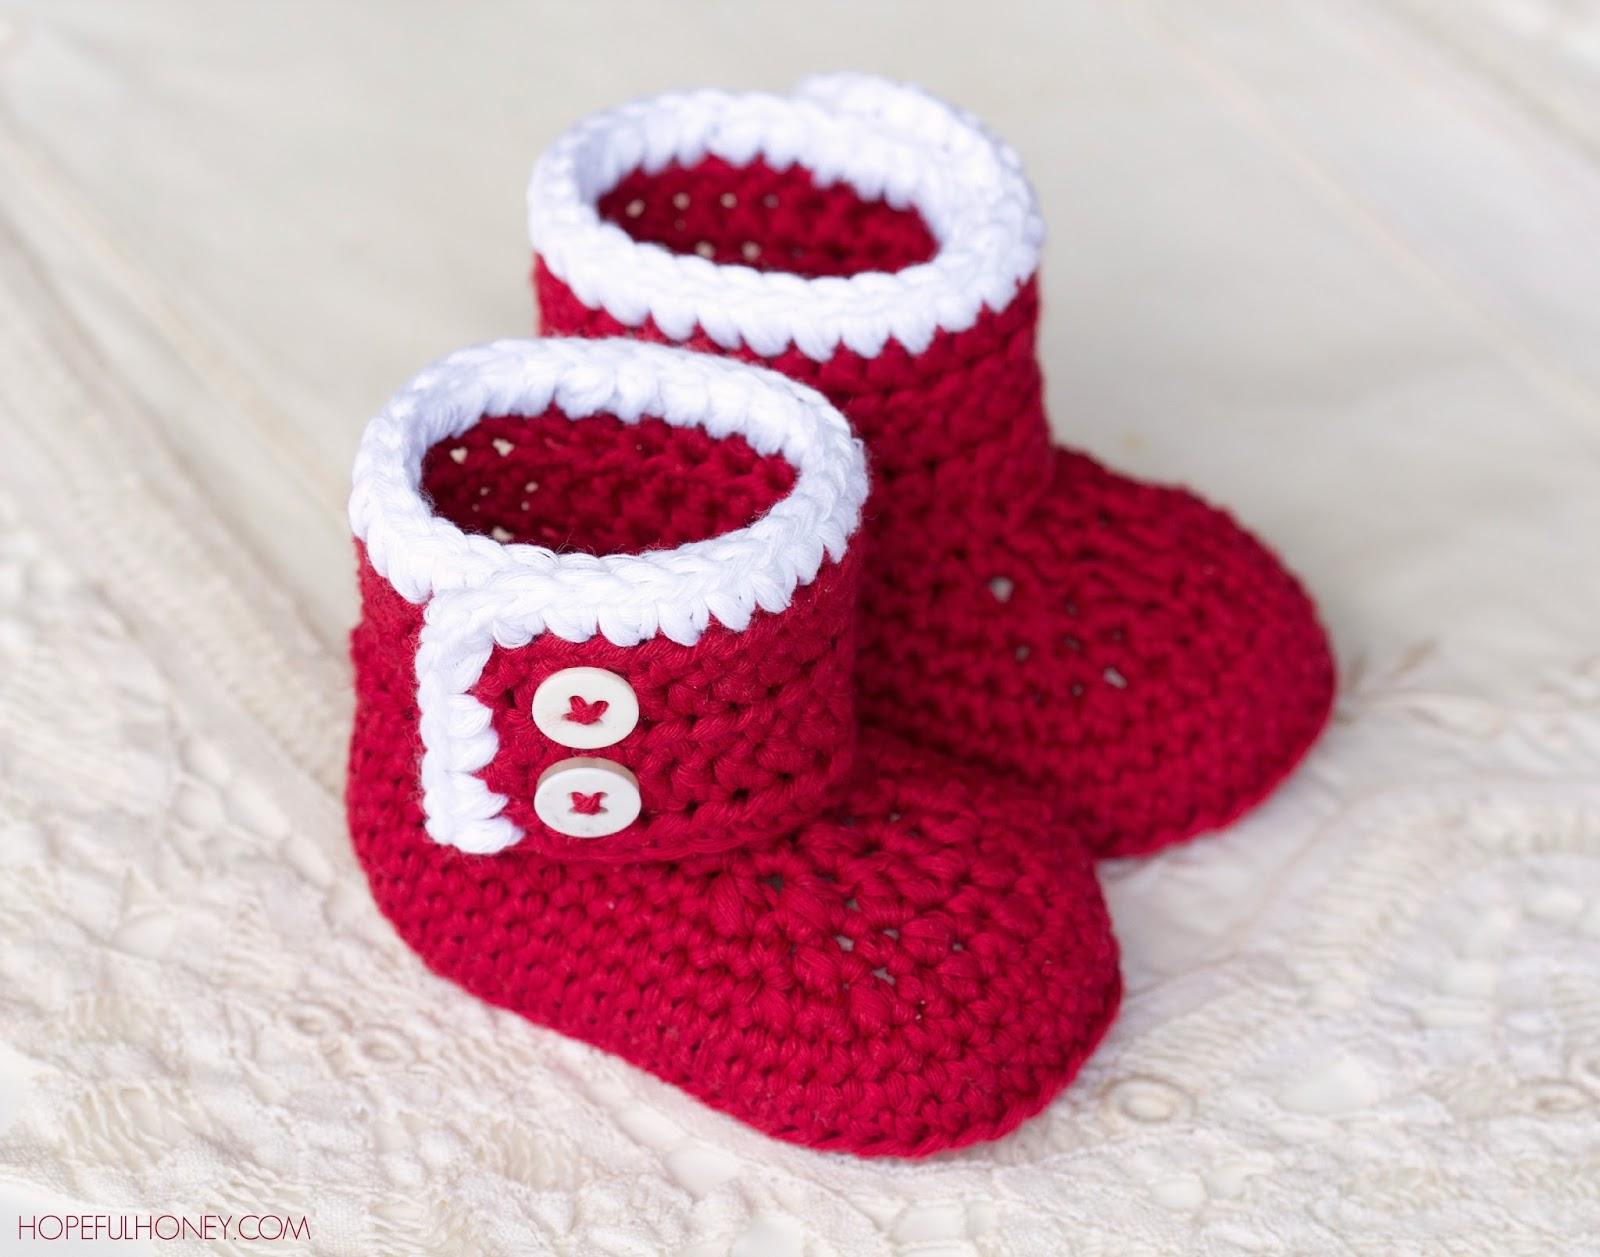 Crochet Baby Ankle Booties Free Pattern : Hopeful Honey Craft, Crochet, Create: Santa Baby Ankle ...